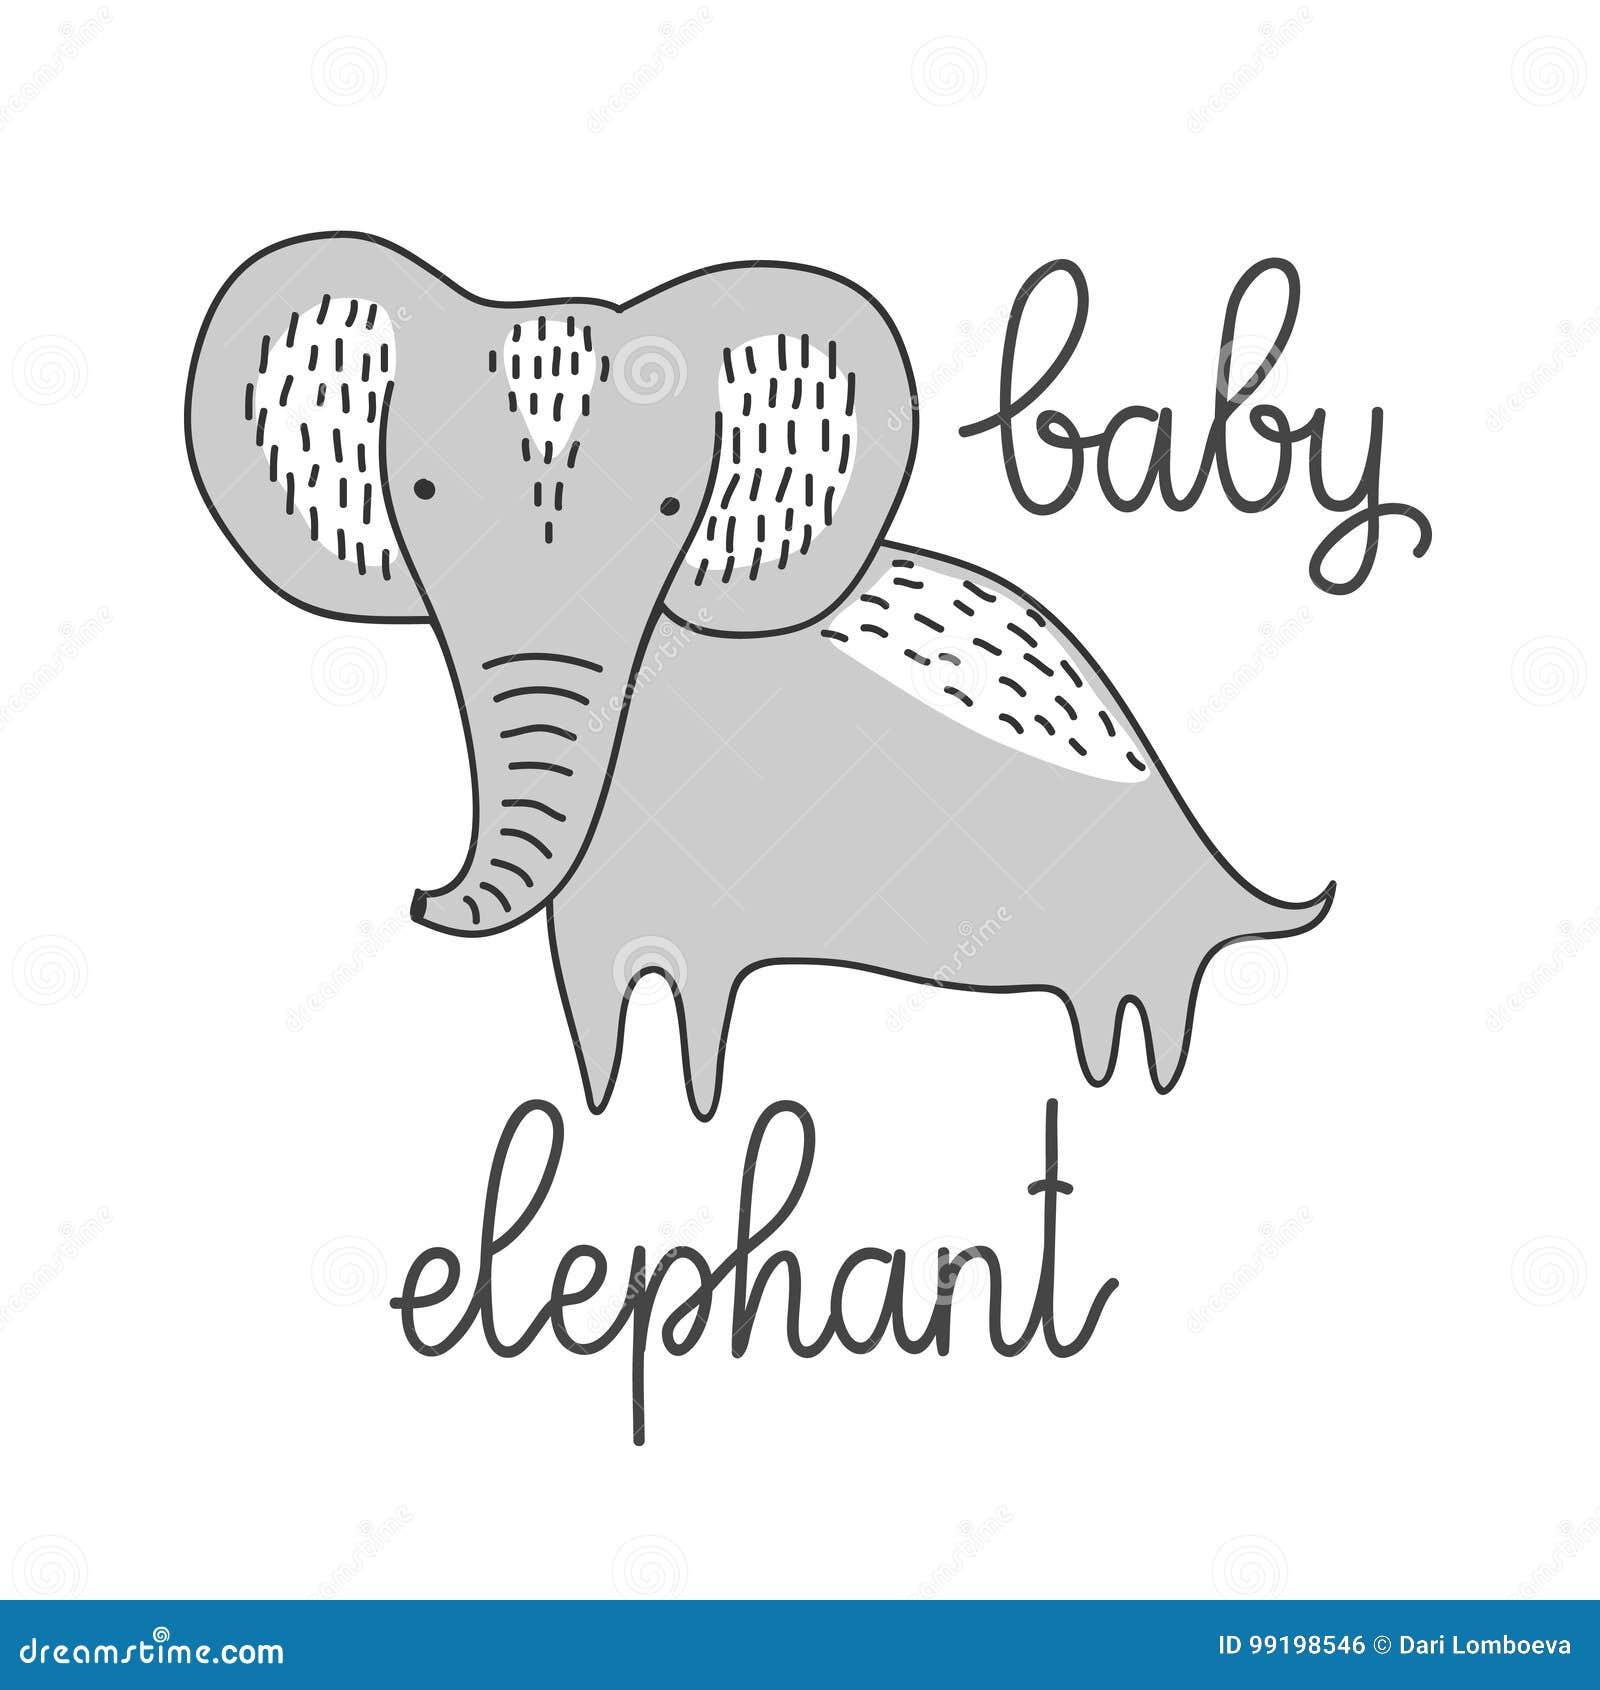 Outline Stencil Printable Elephant Design Pretty   www.picturesboss.com